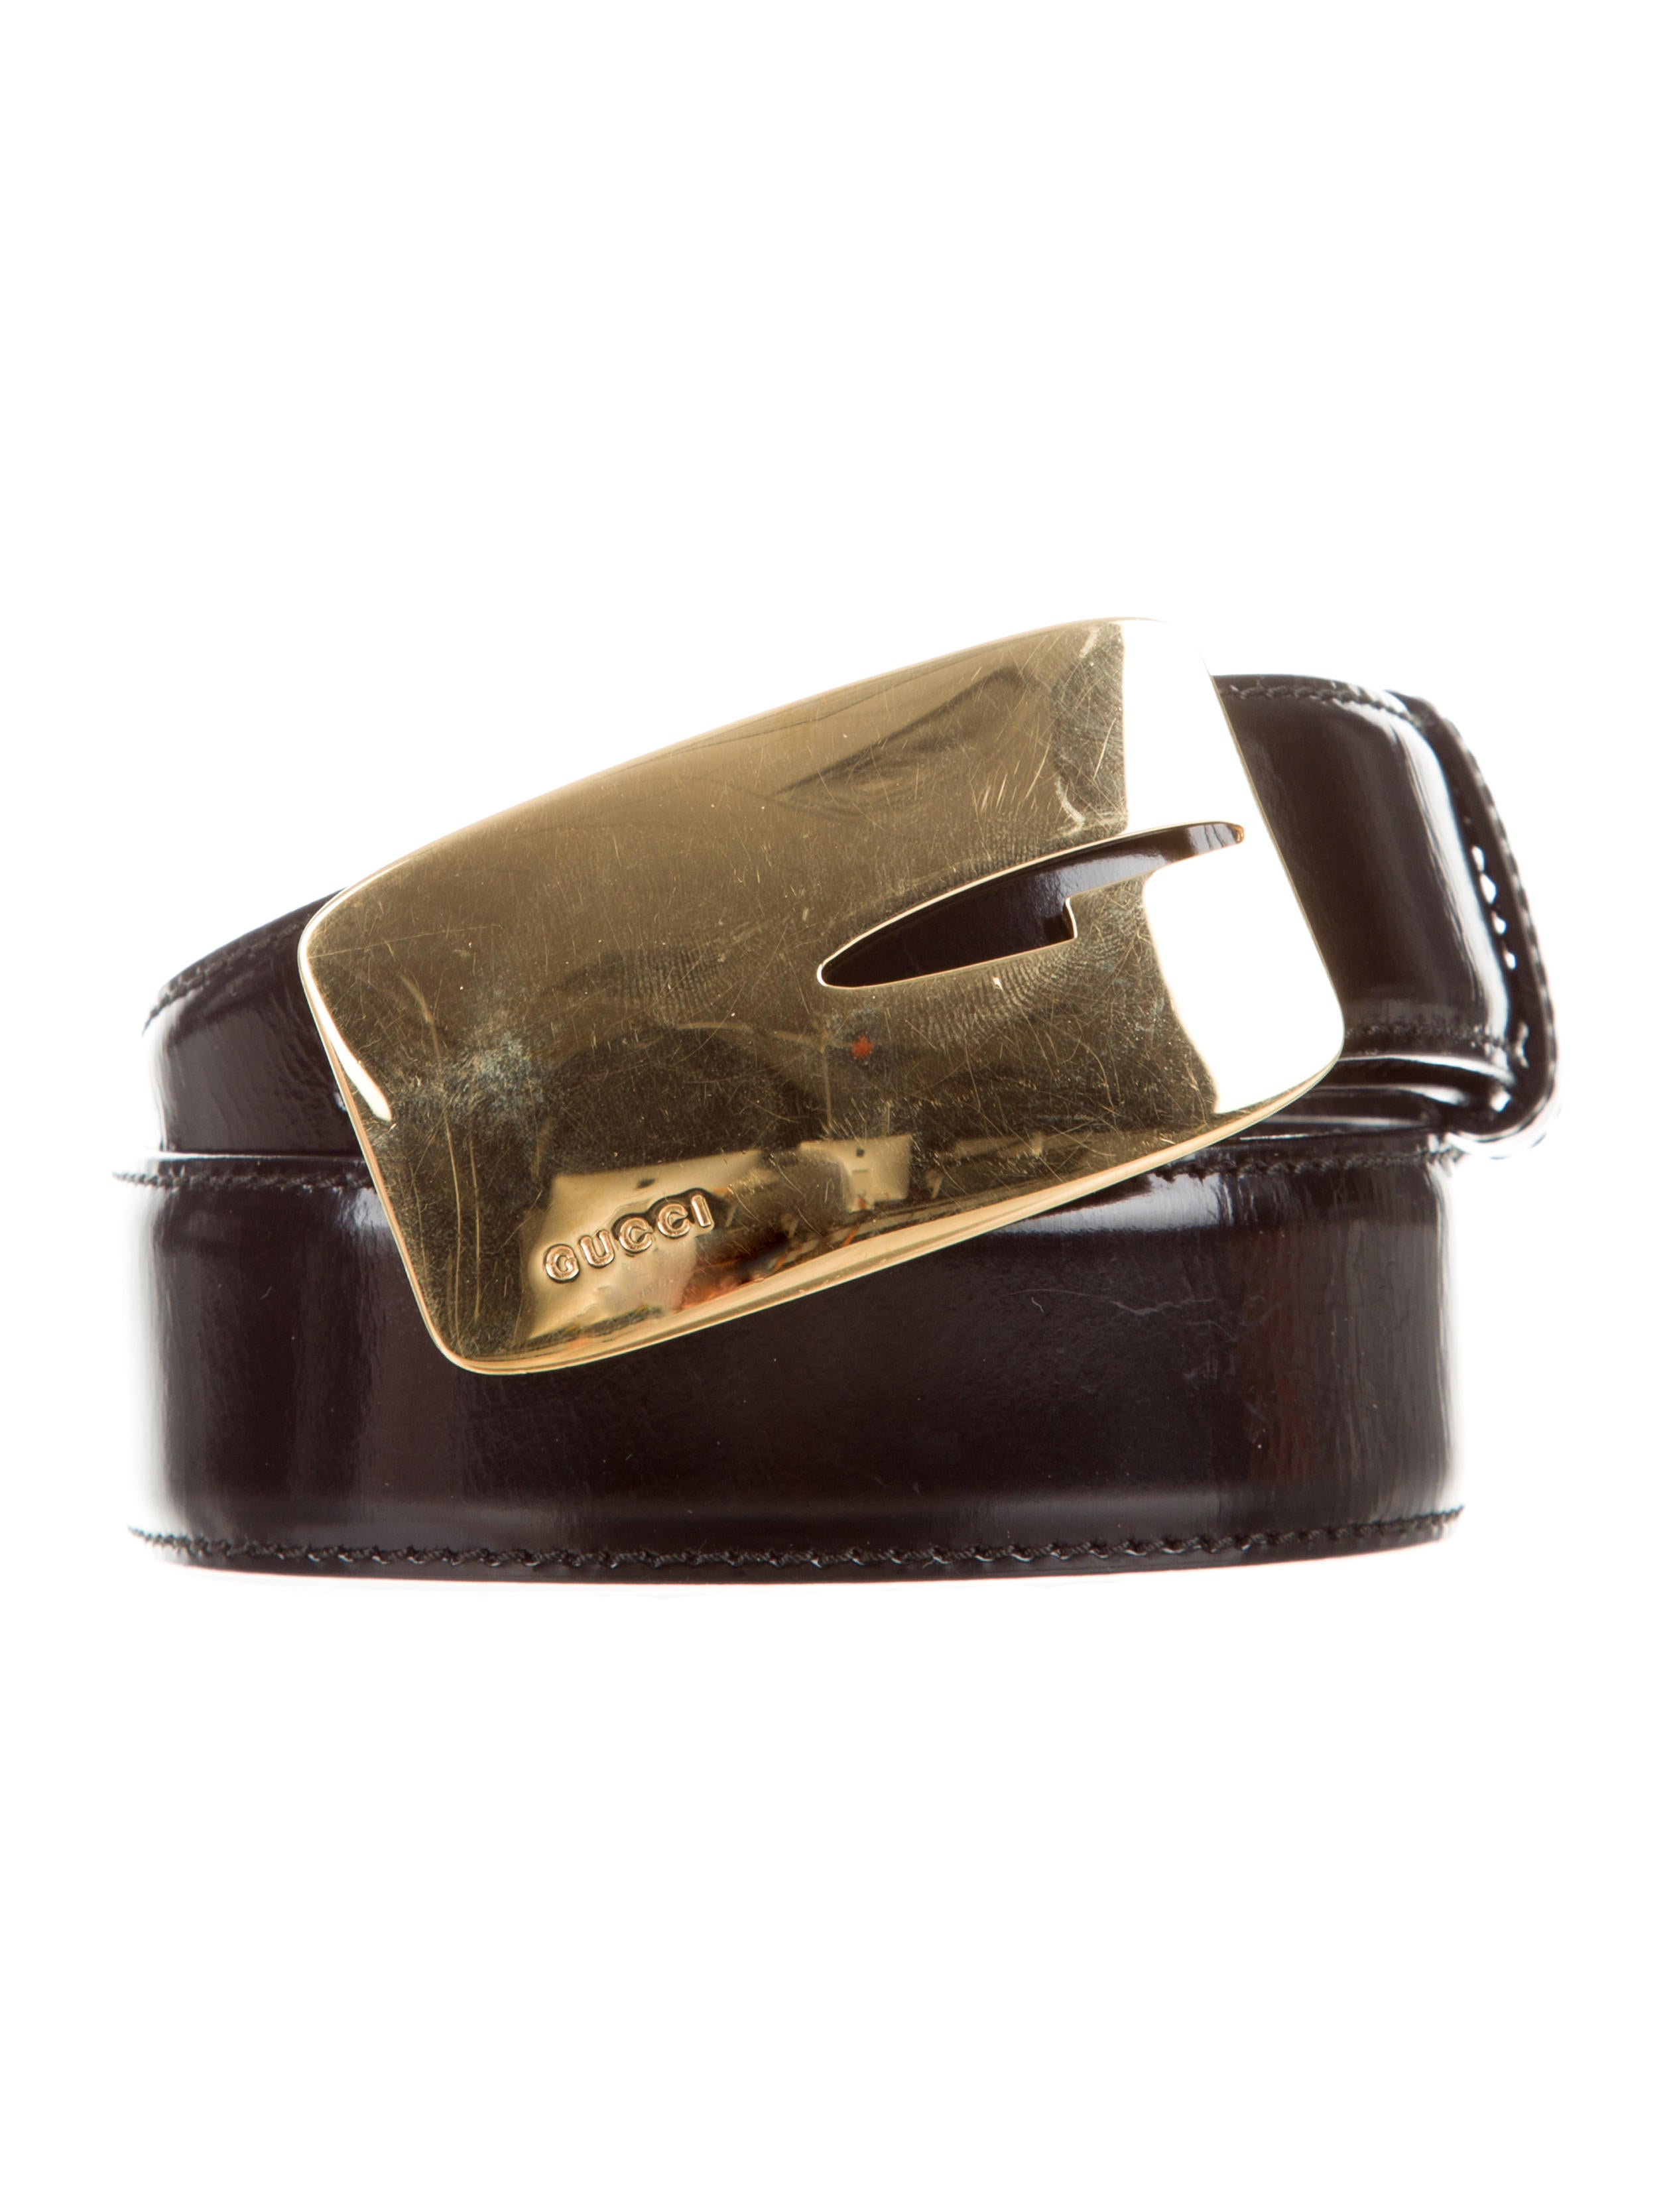 gucci black patent leather belt accessories guc79767